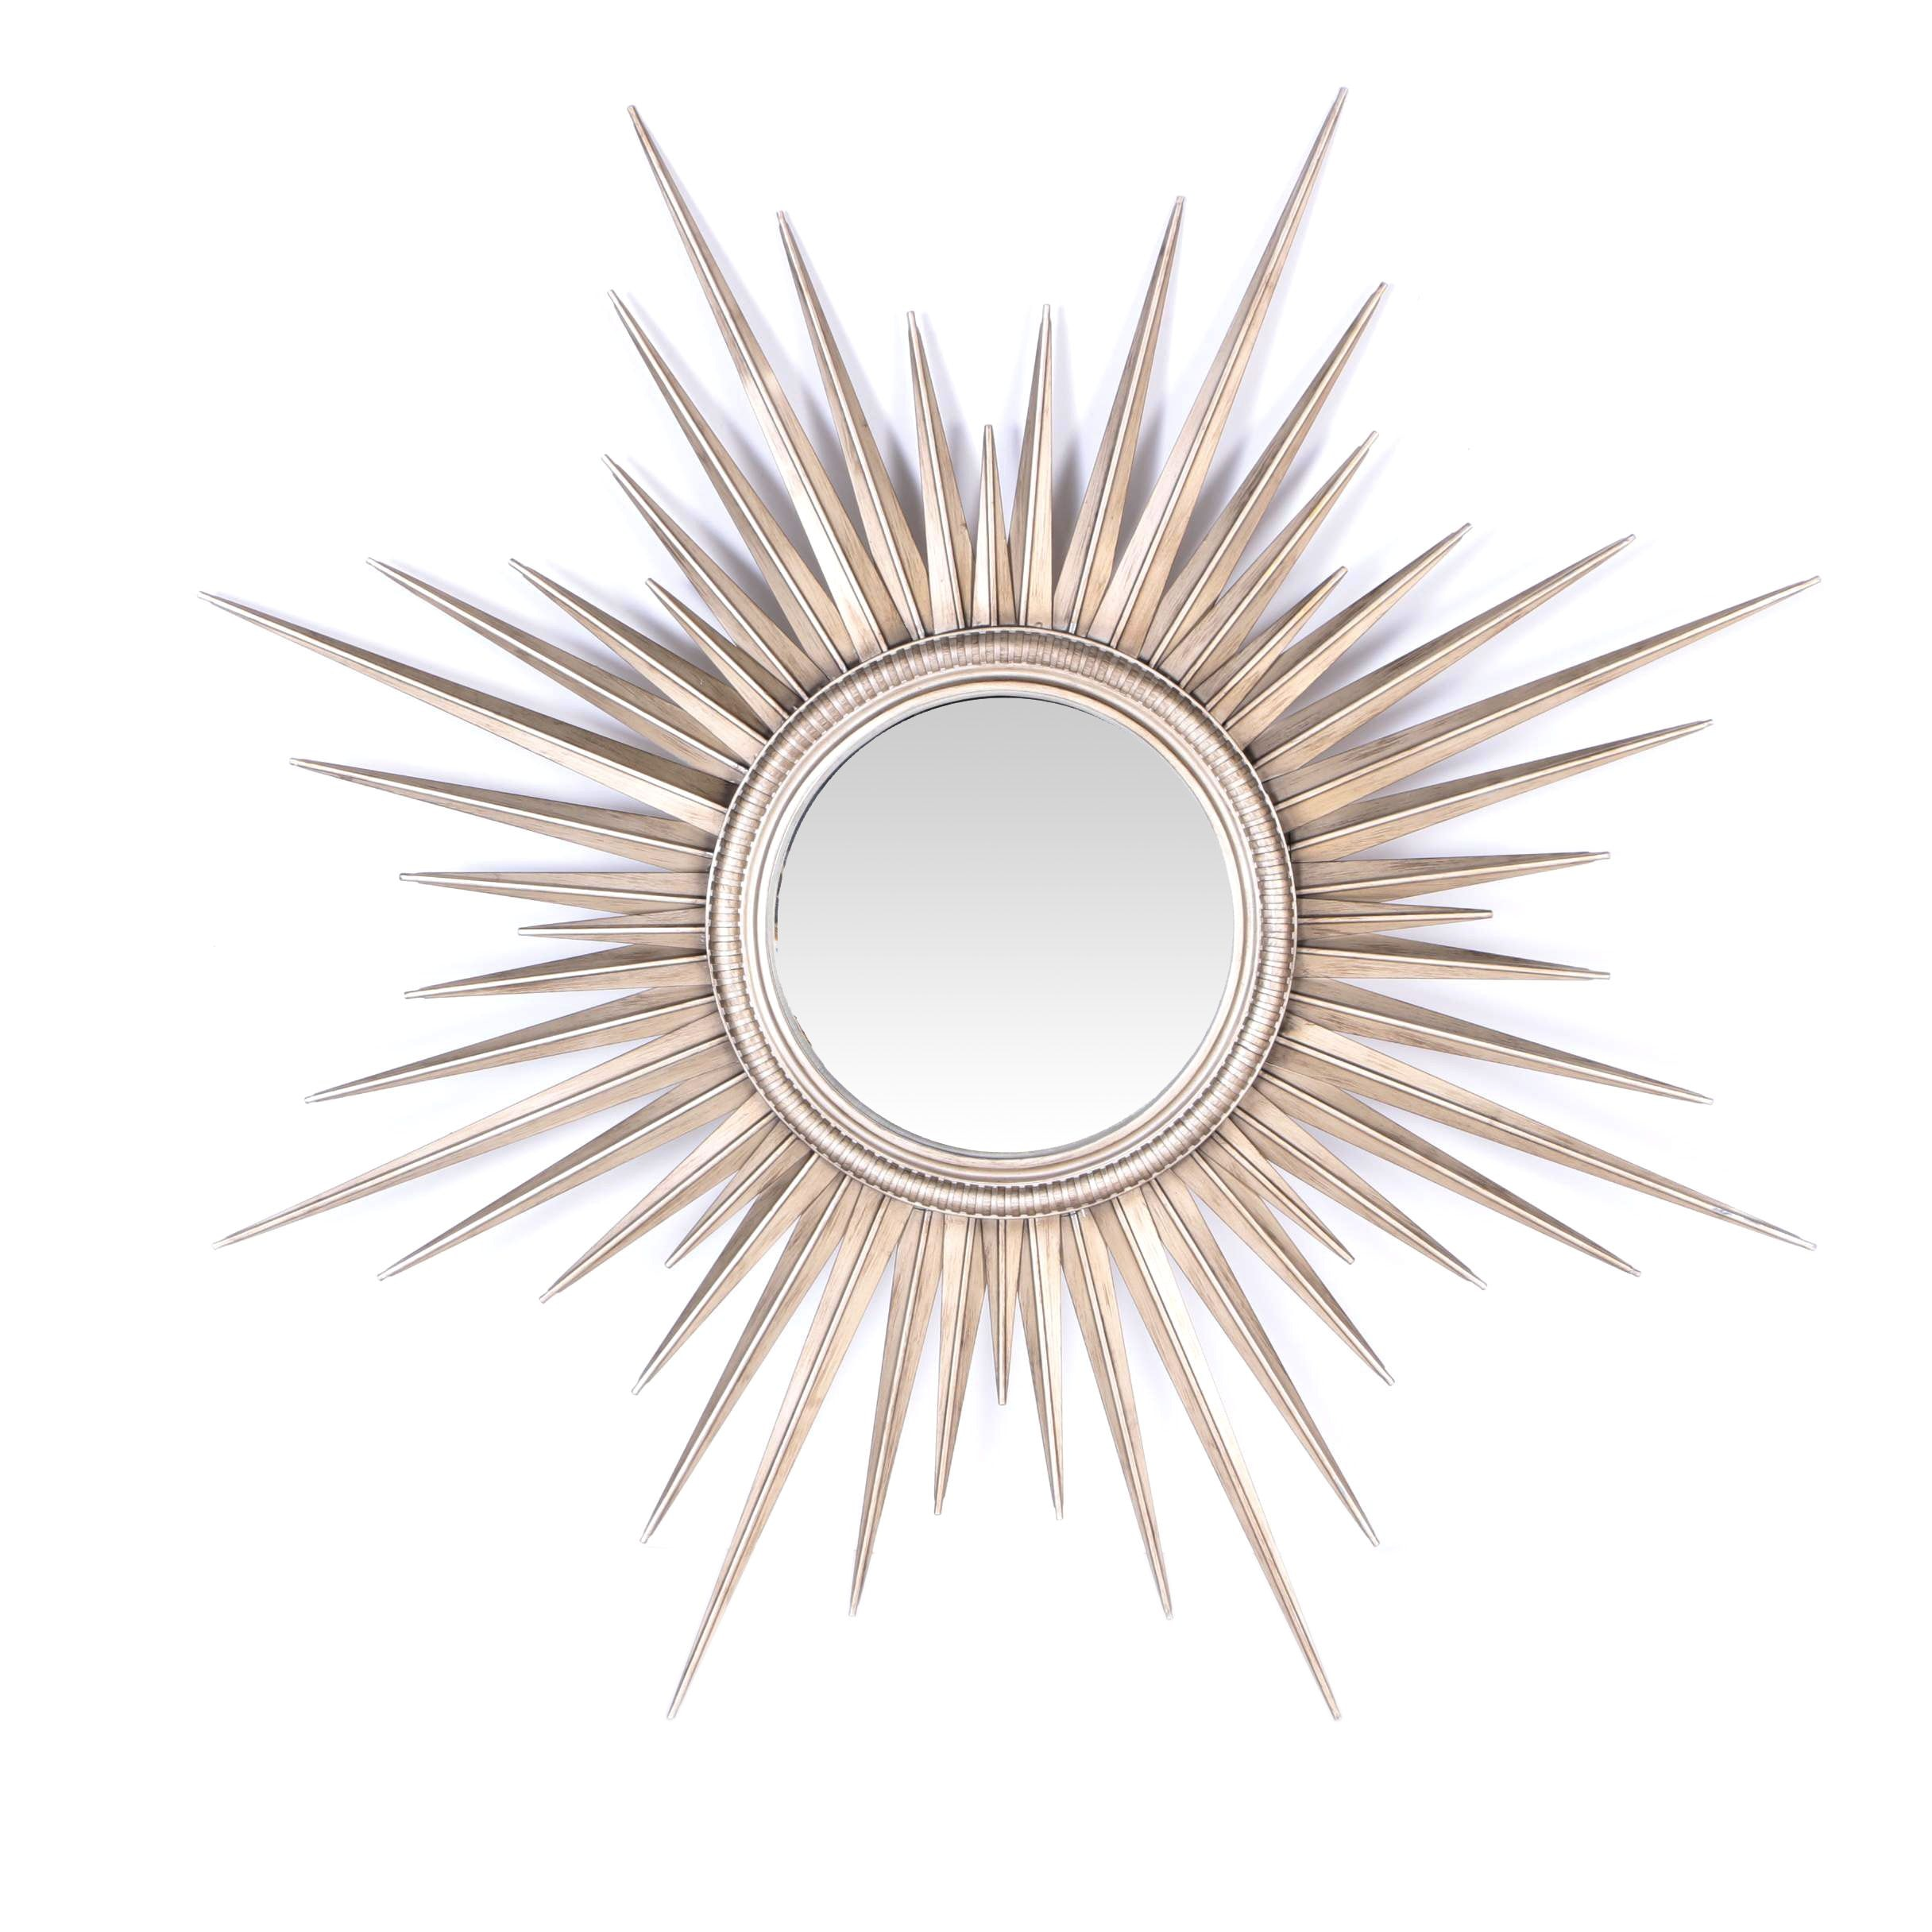 Restoration Hardware Sunburst Wall Mirror